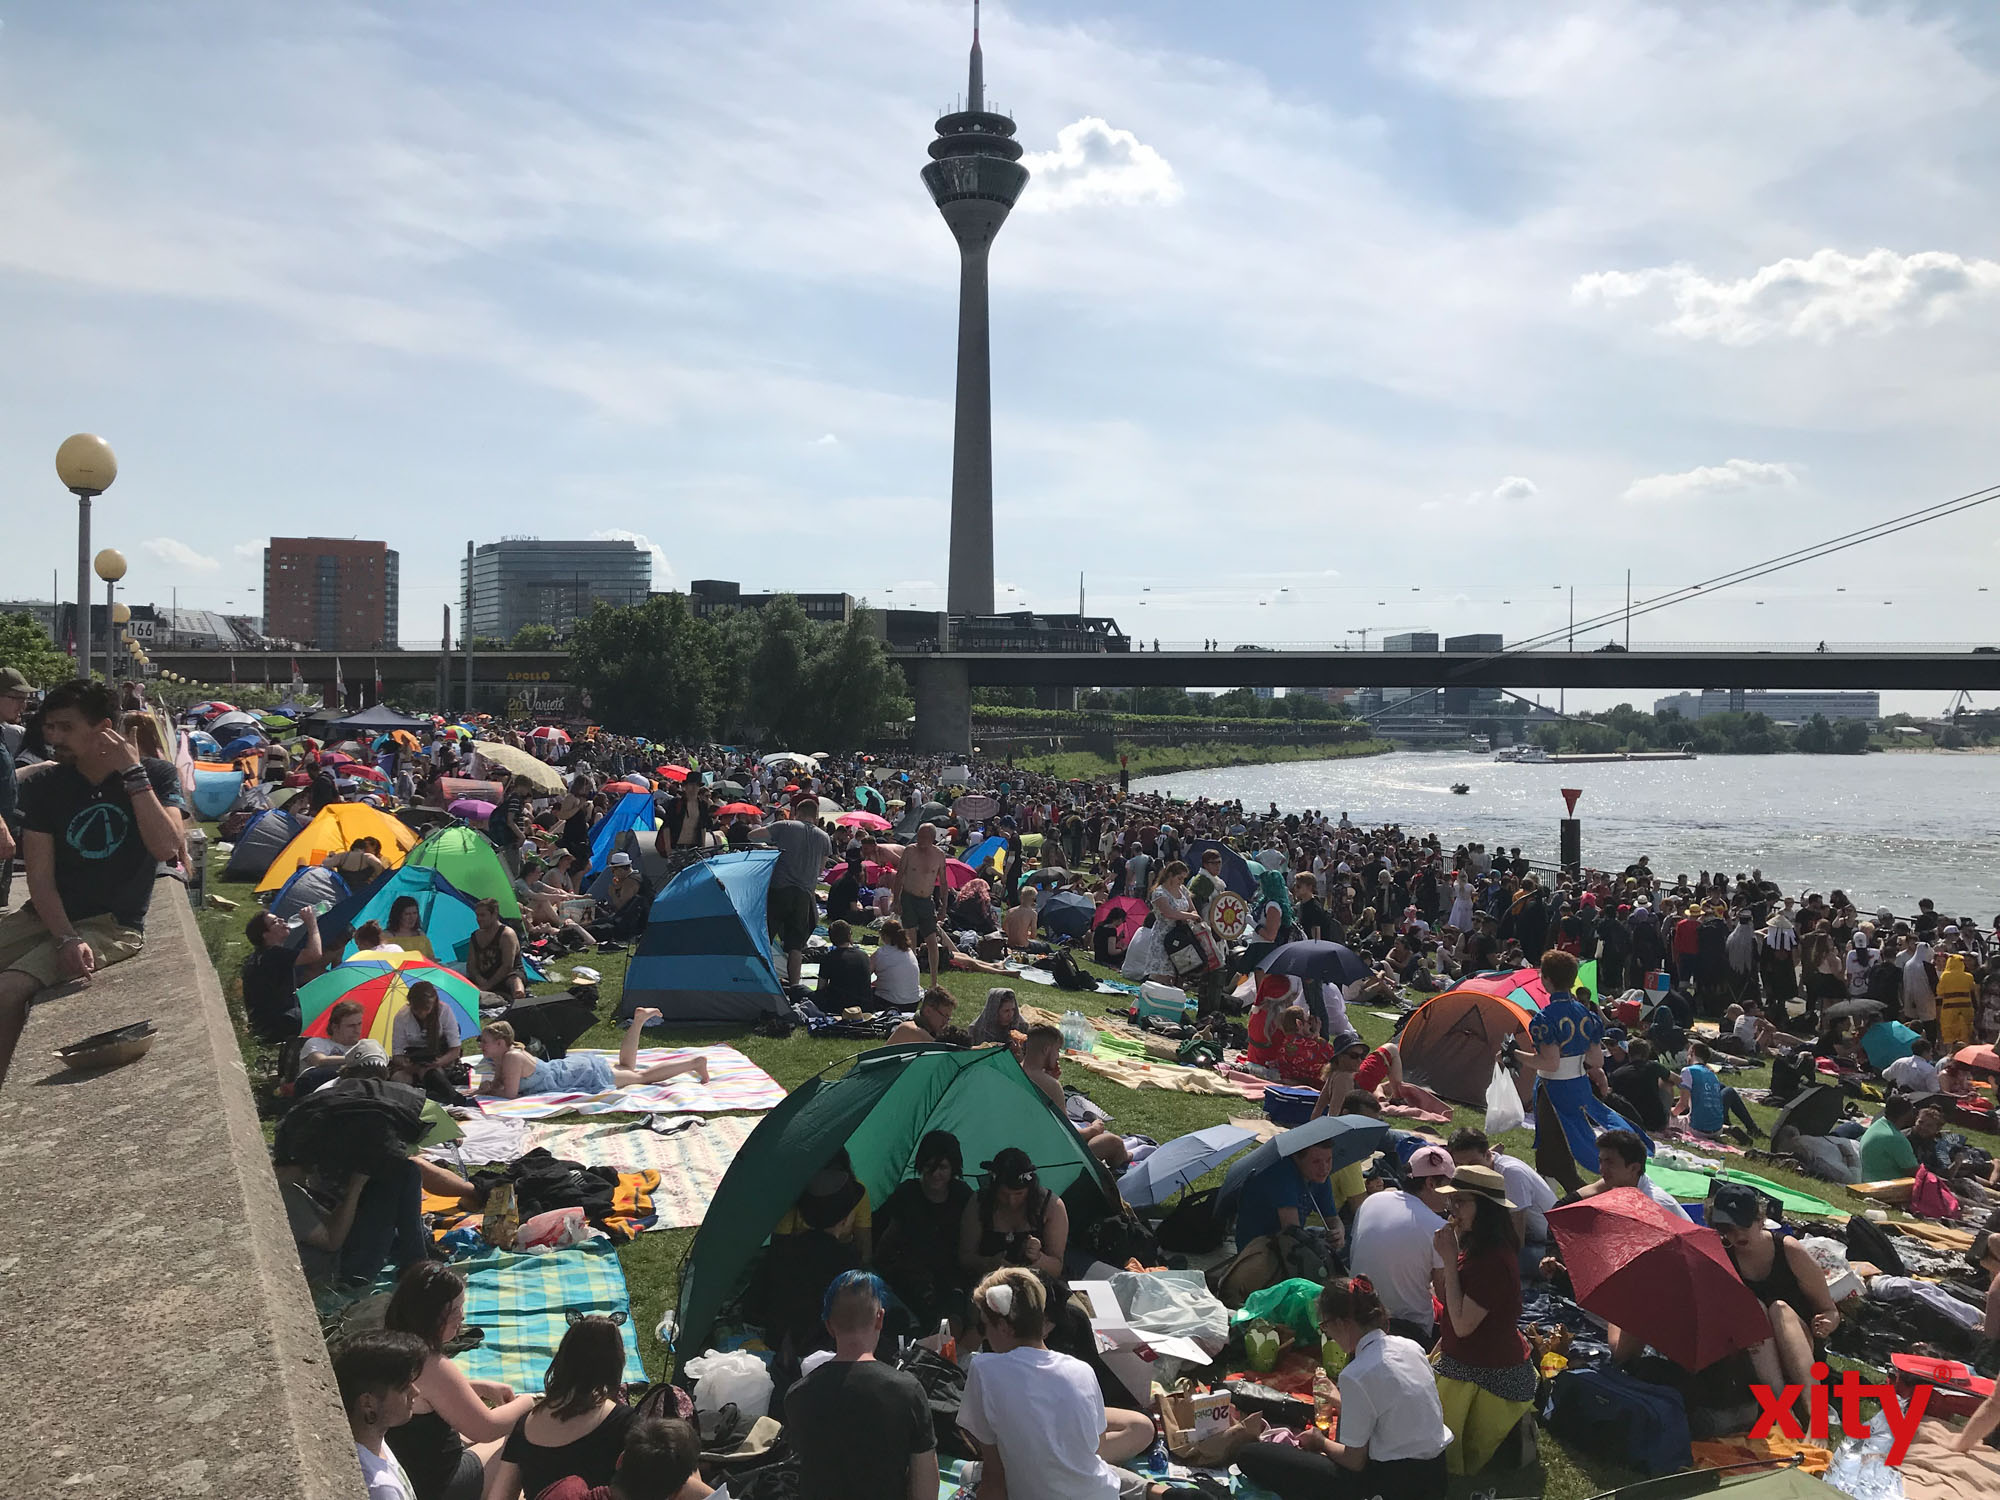 Hunderttausende Japan-Fans werden in Düsseldorf erwartet (Foto: xity)